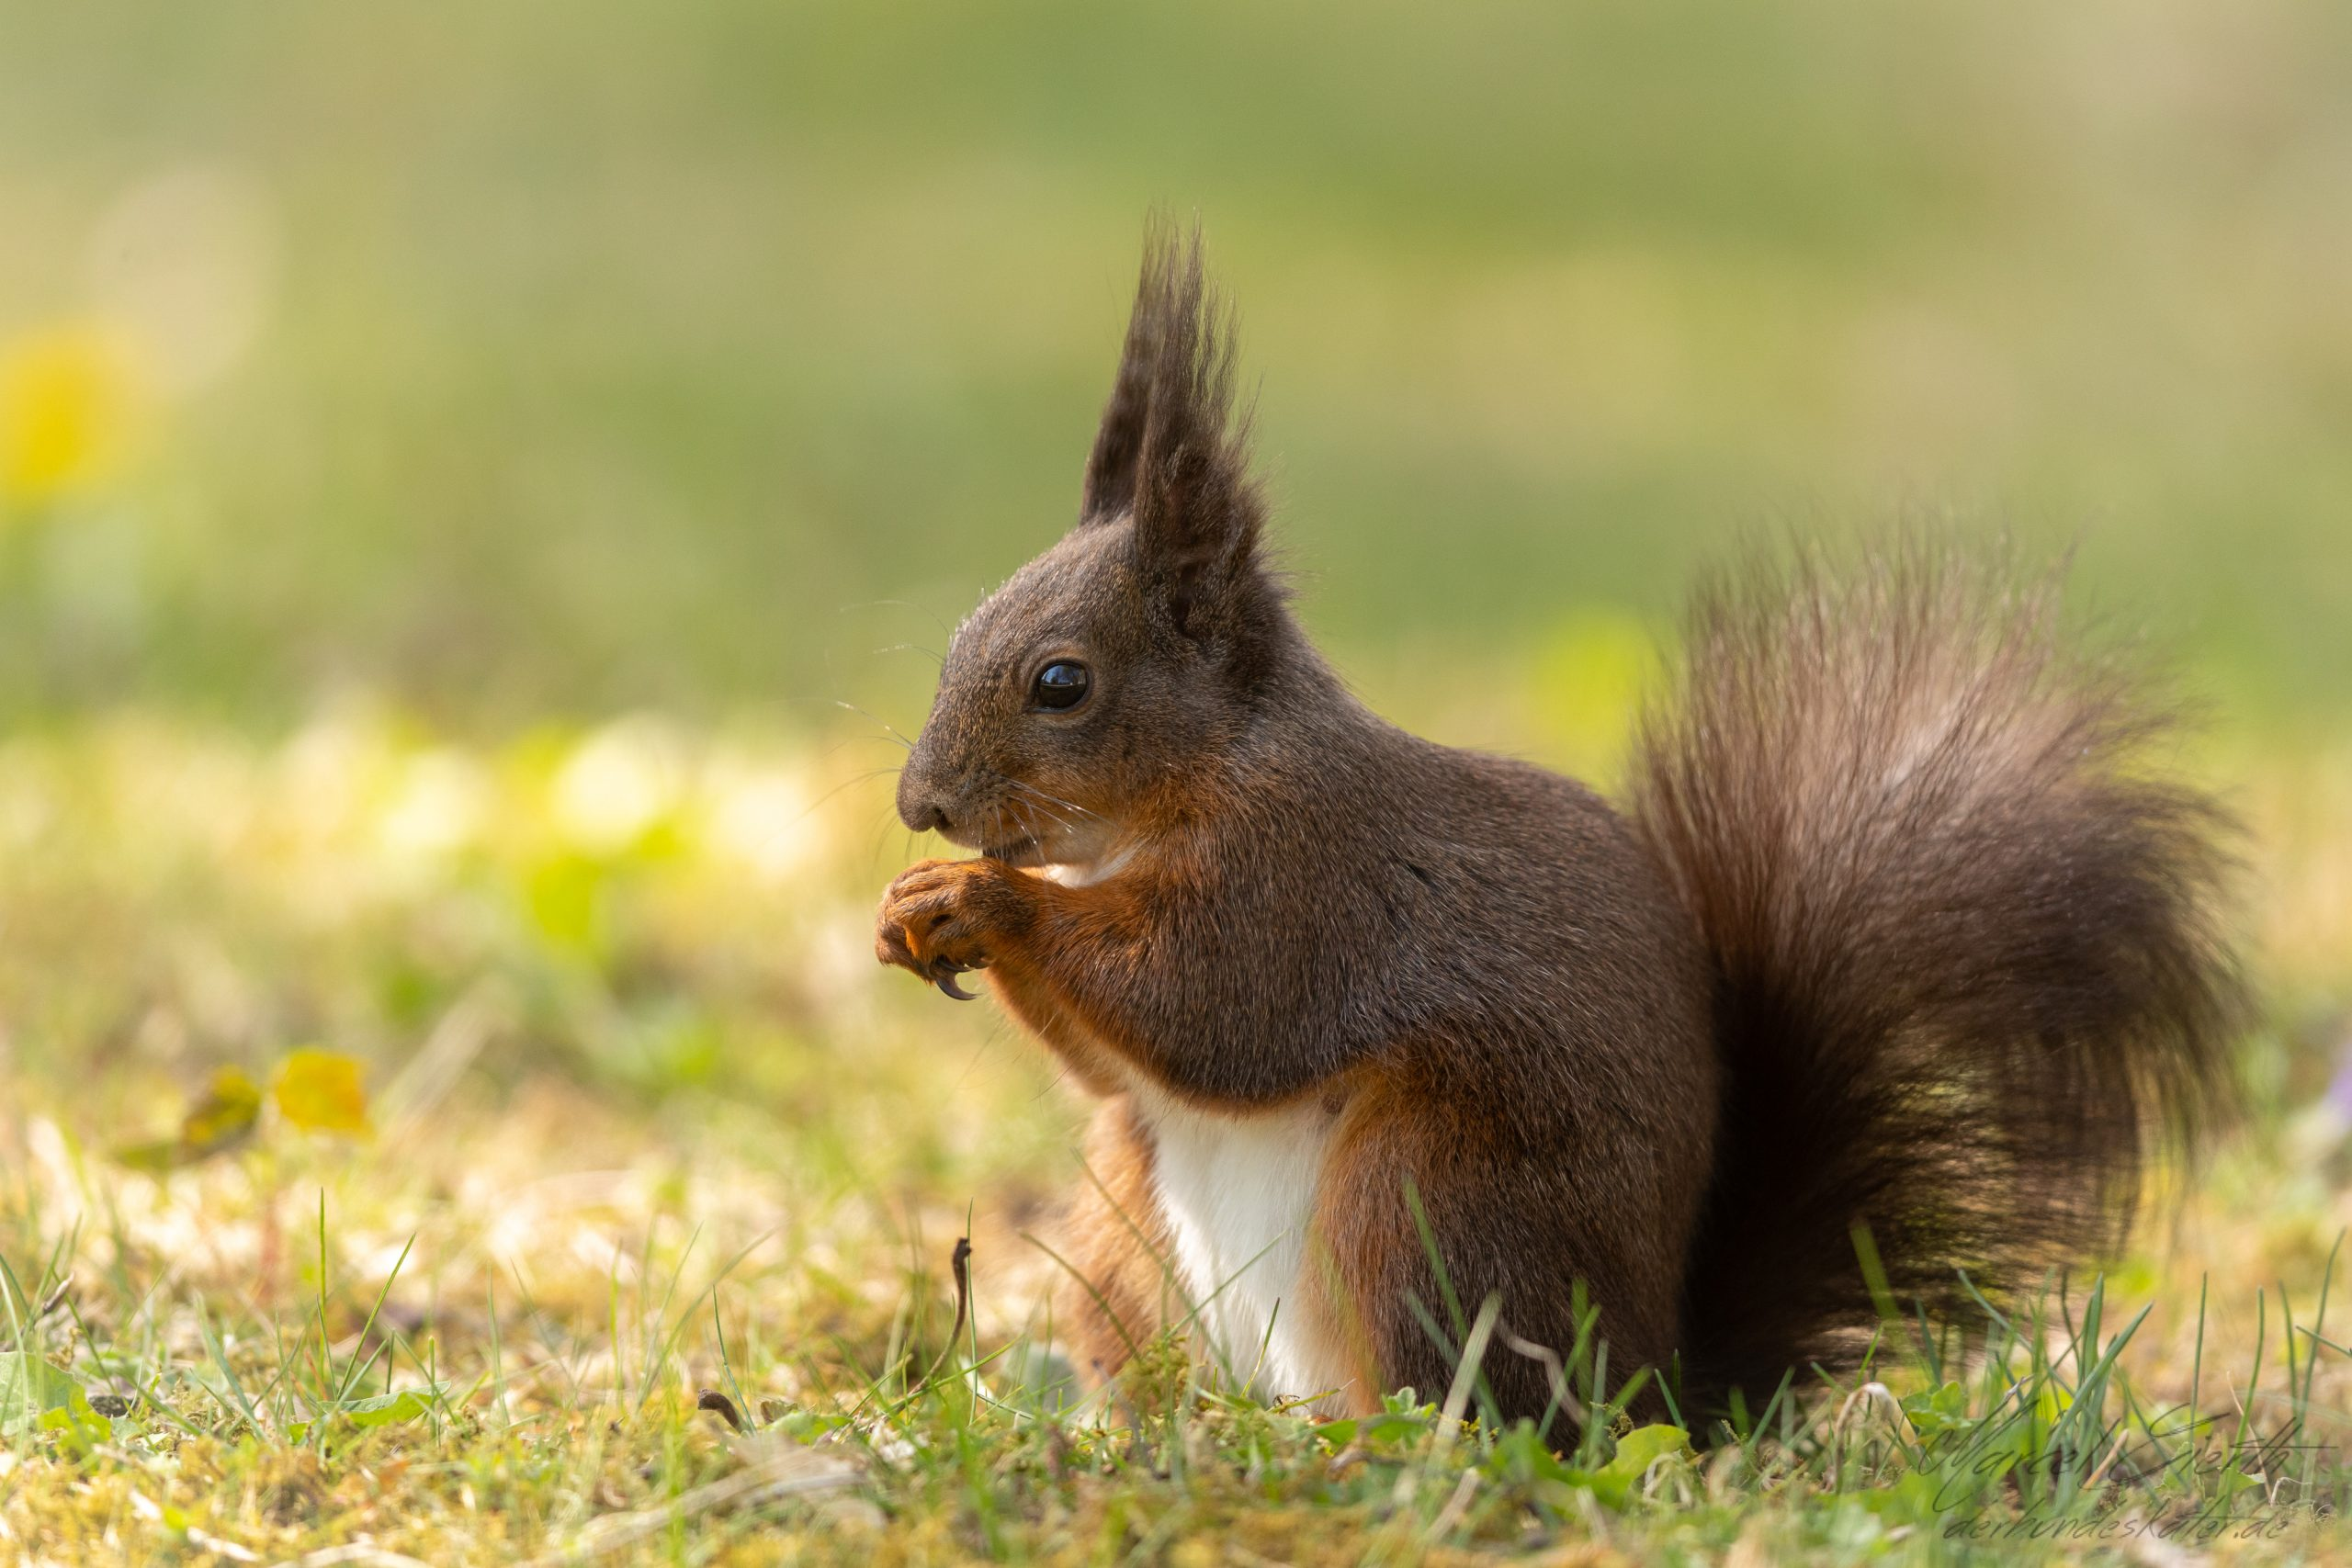 Rückblick: Eichhörnchen auf dem Friedhof Fotograf: Marcel Gierth